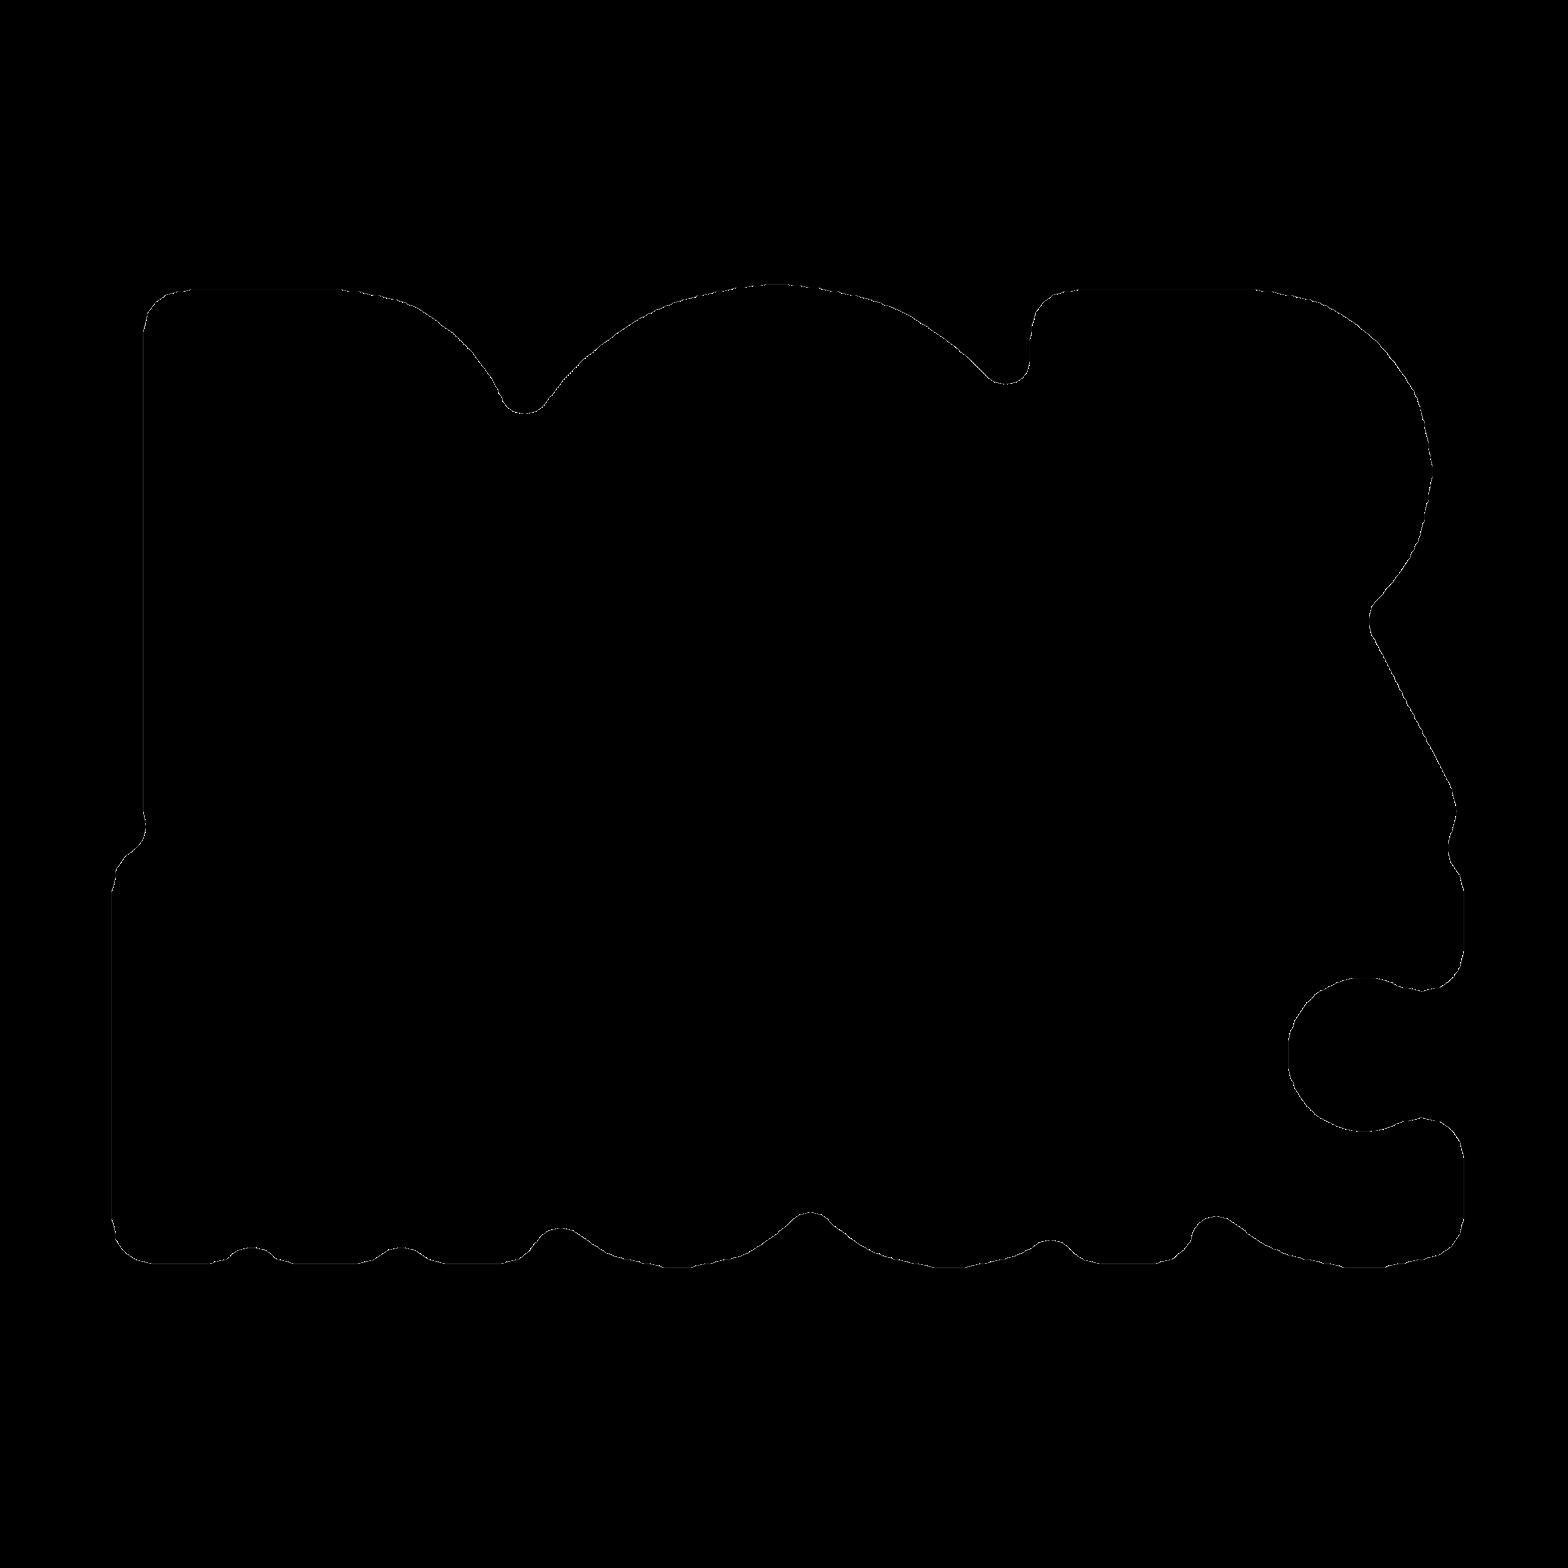 BOR MUSIC Linktree (BORMUSIC) Profile Image | Linktree